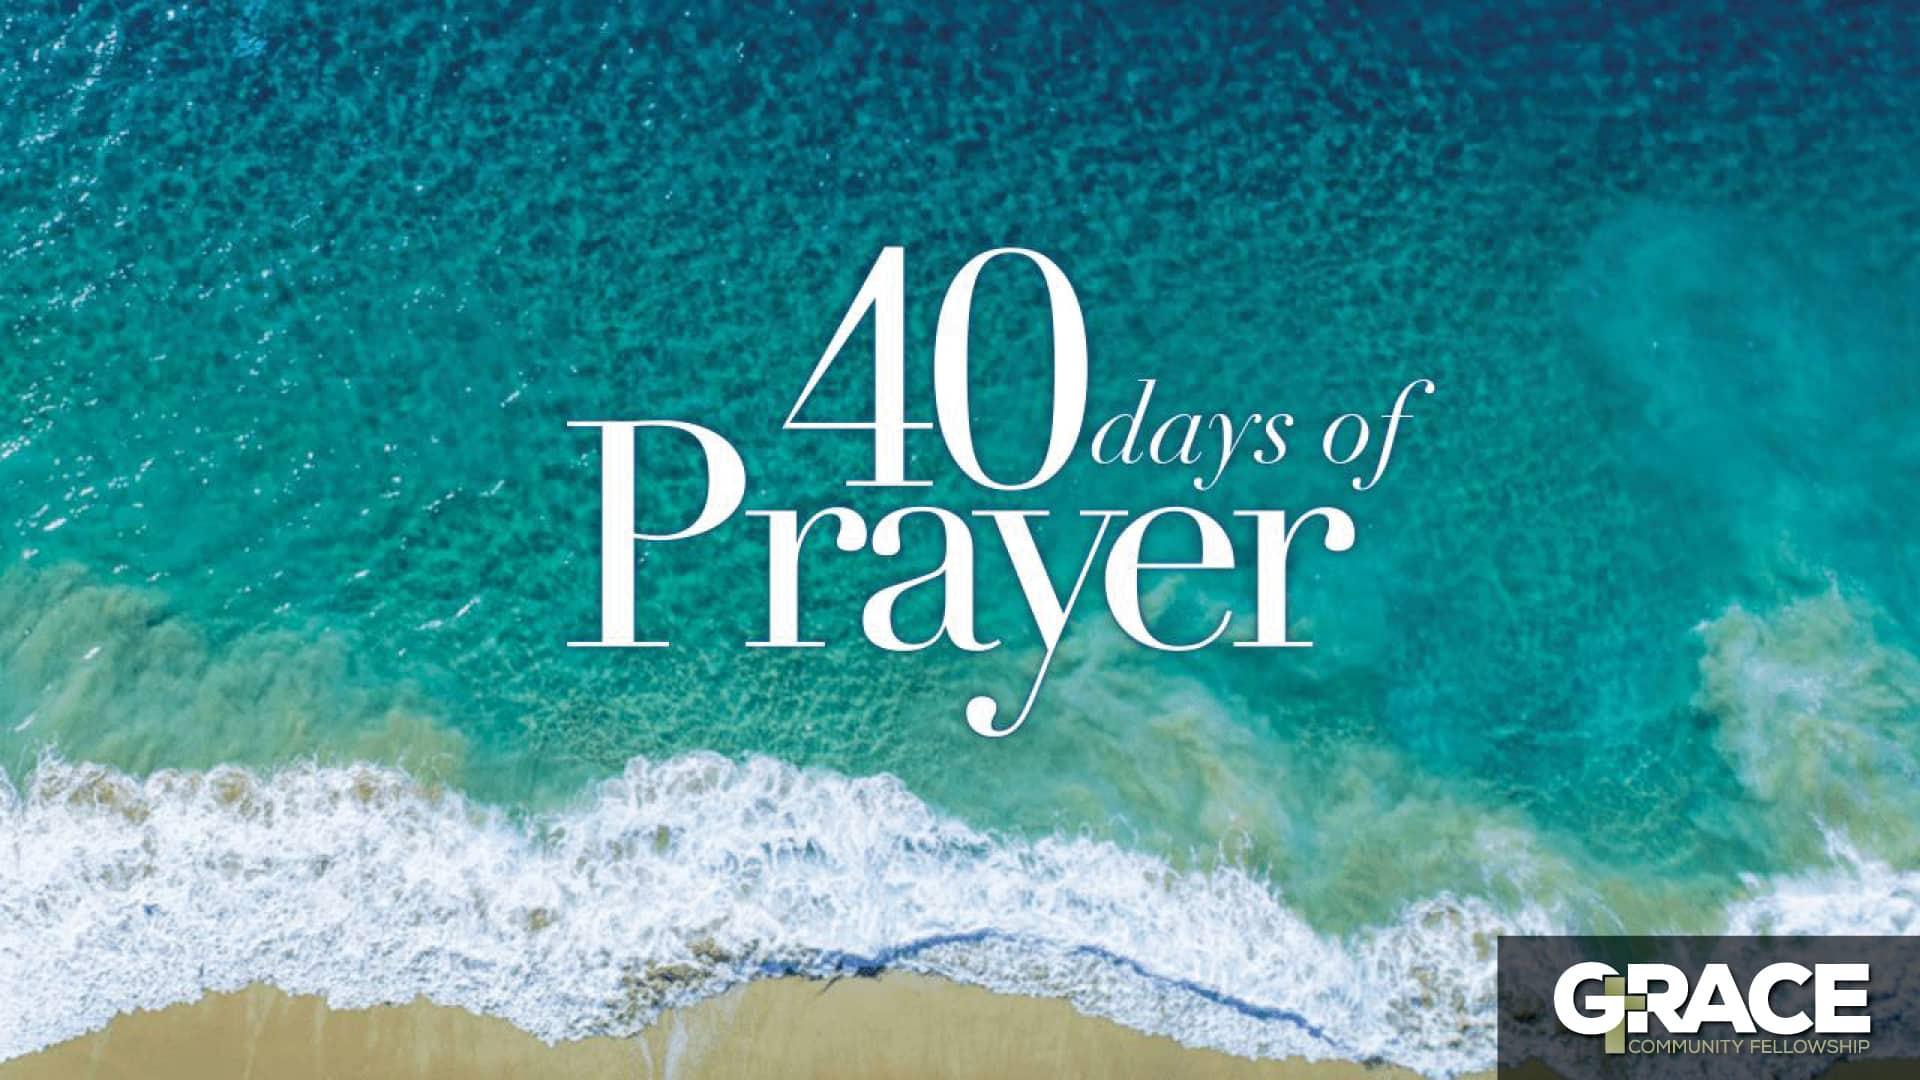 Does god say no to prayers